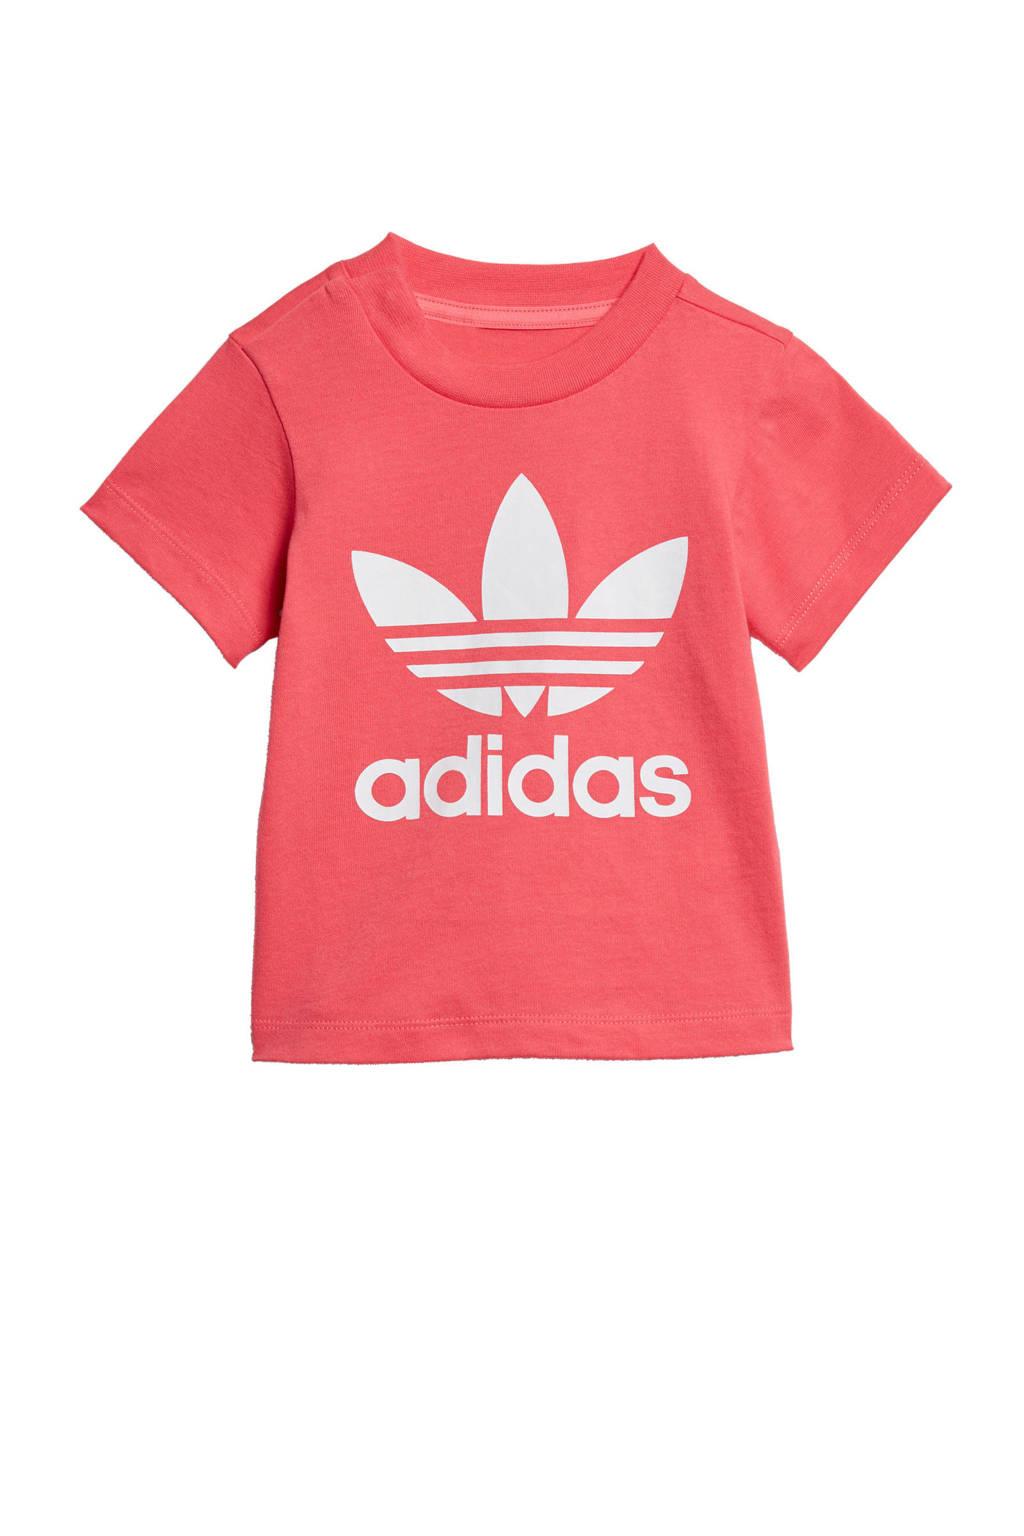 adidas originals Adicolor T-shirt roze, Roze/wit